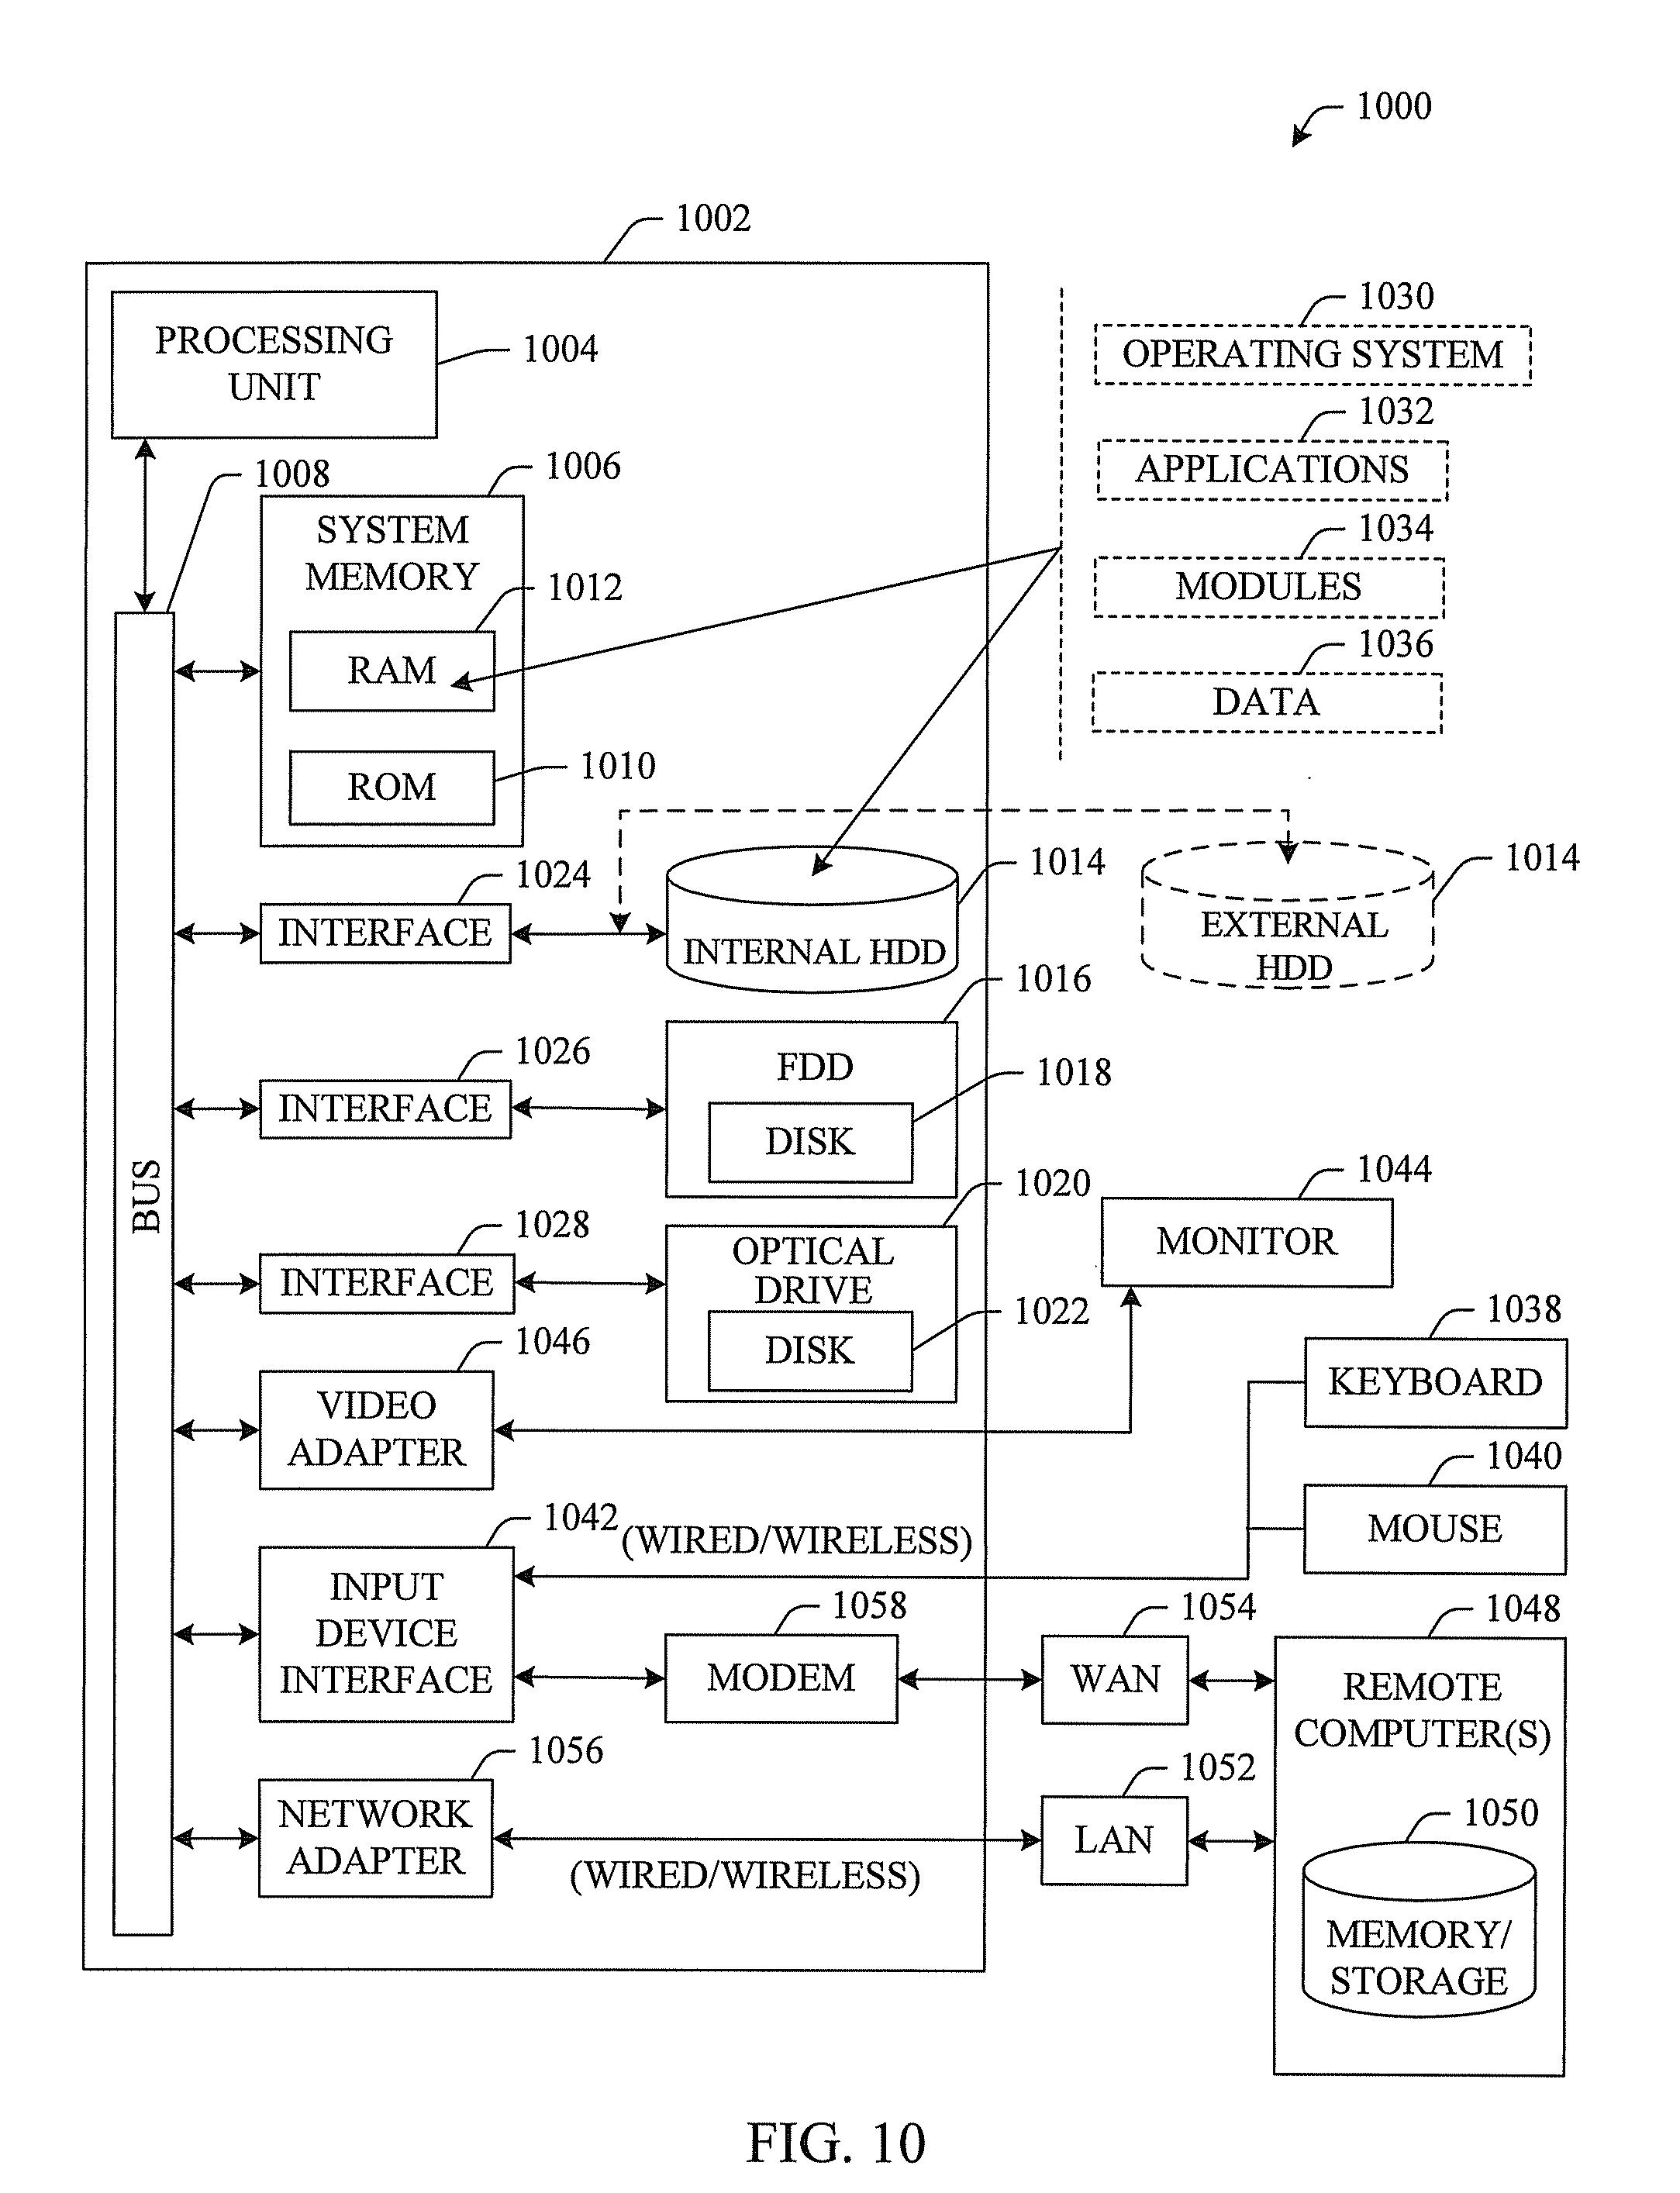 knn classifier used in real-world applications